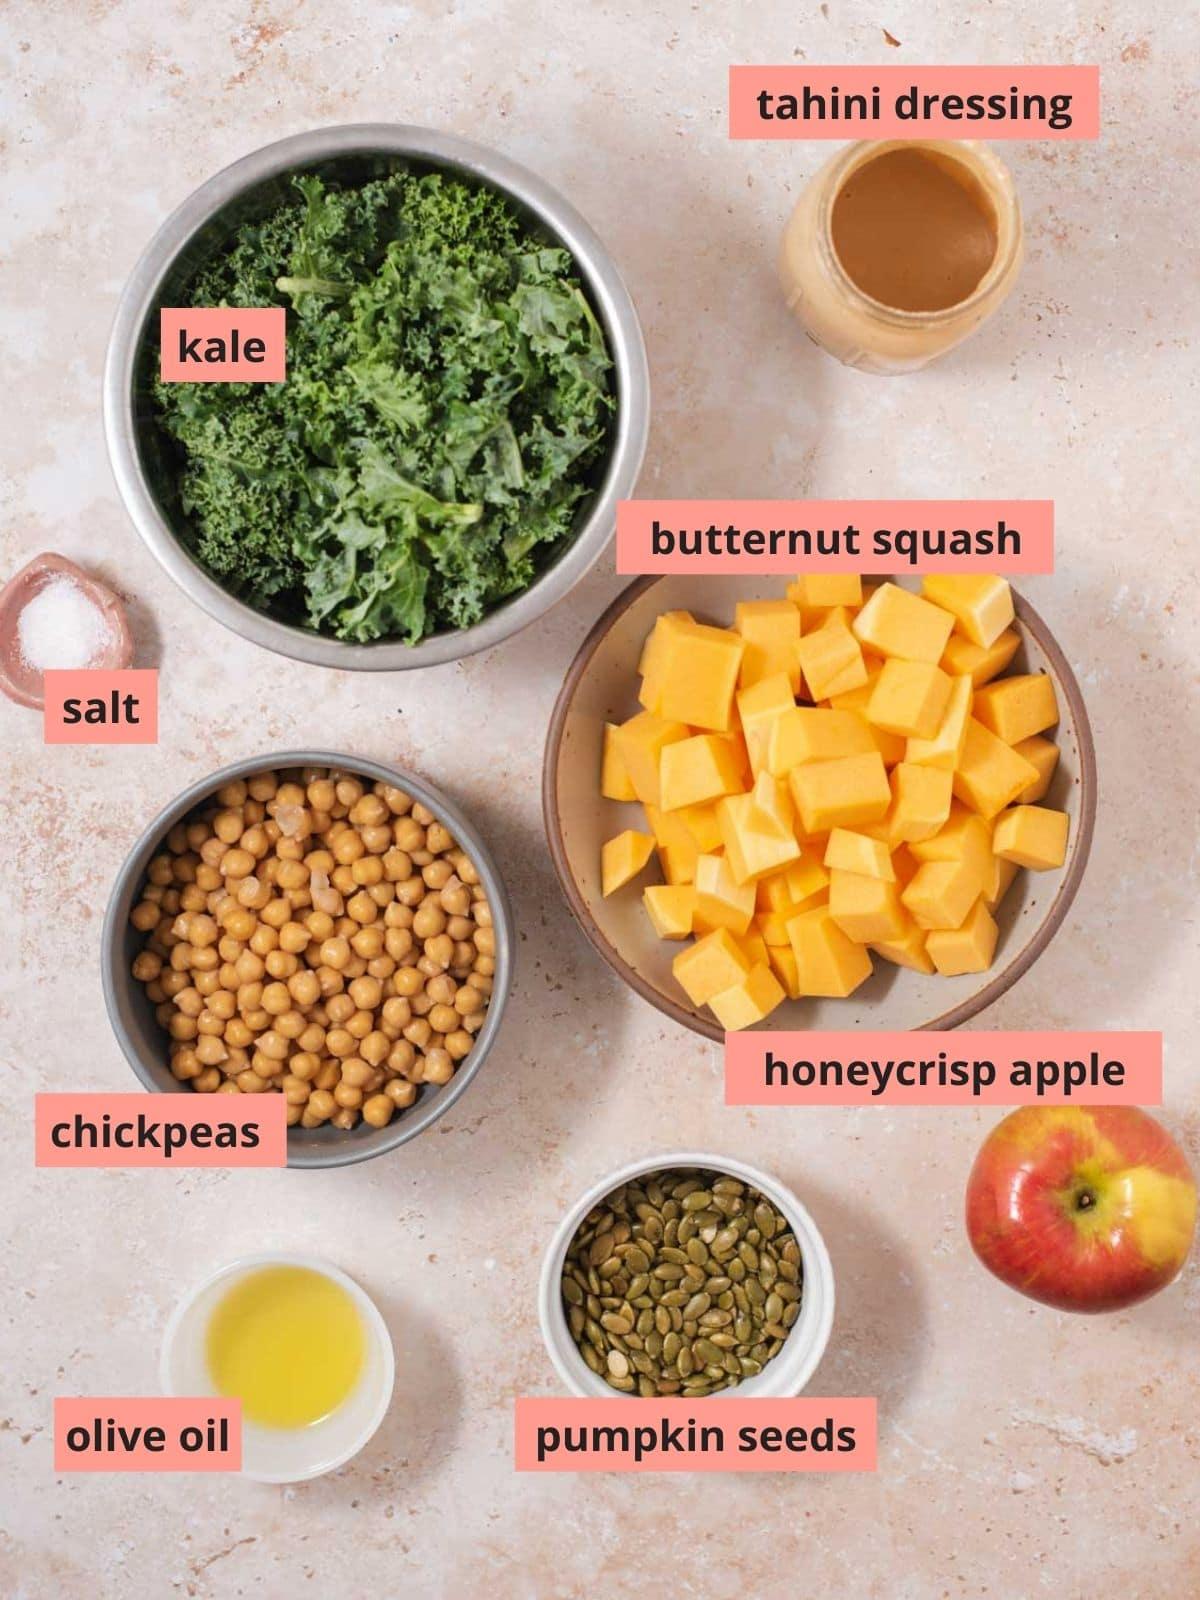 Labeled ingredients used to make kale salad